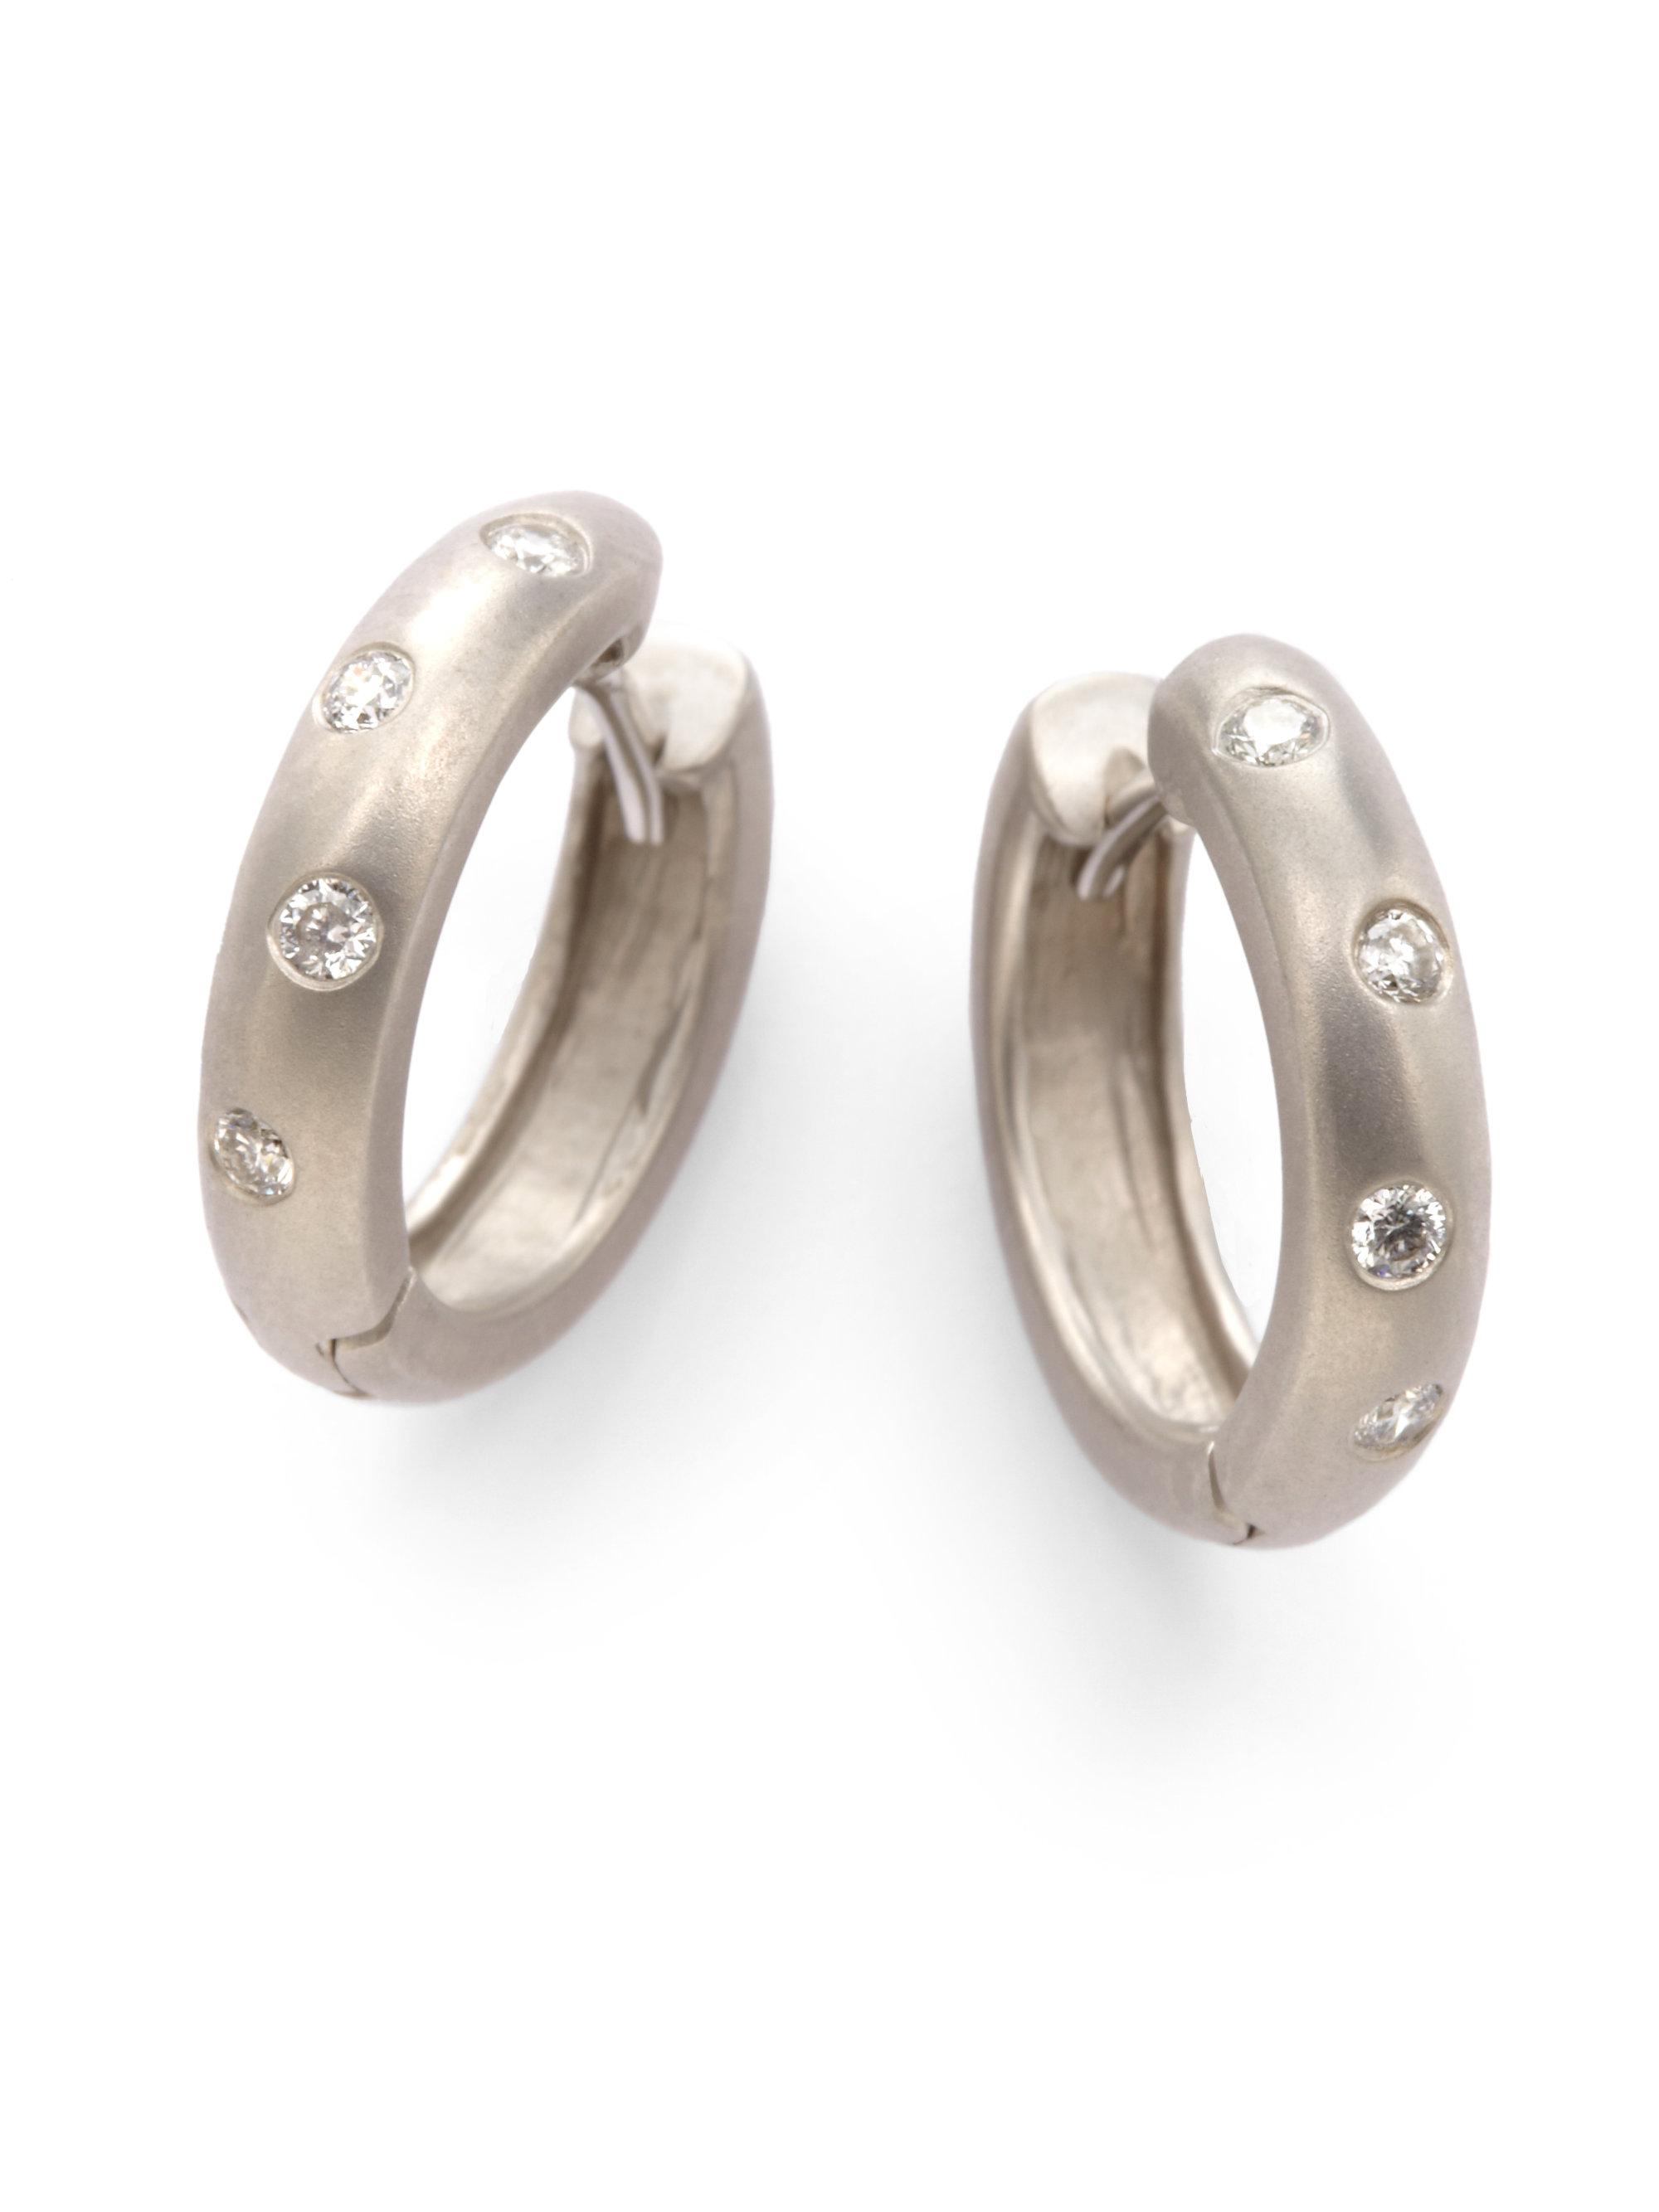 Kc designs Diamond Hoop Earrings in Metallic